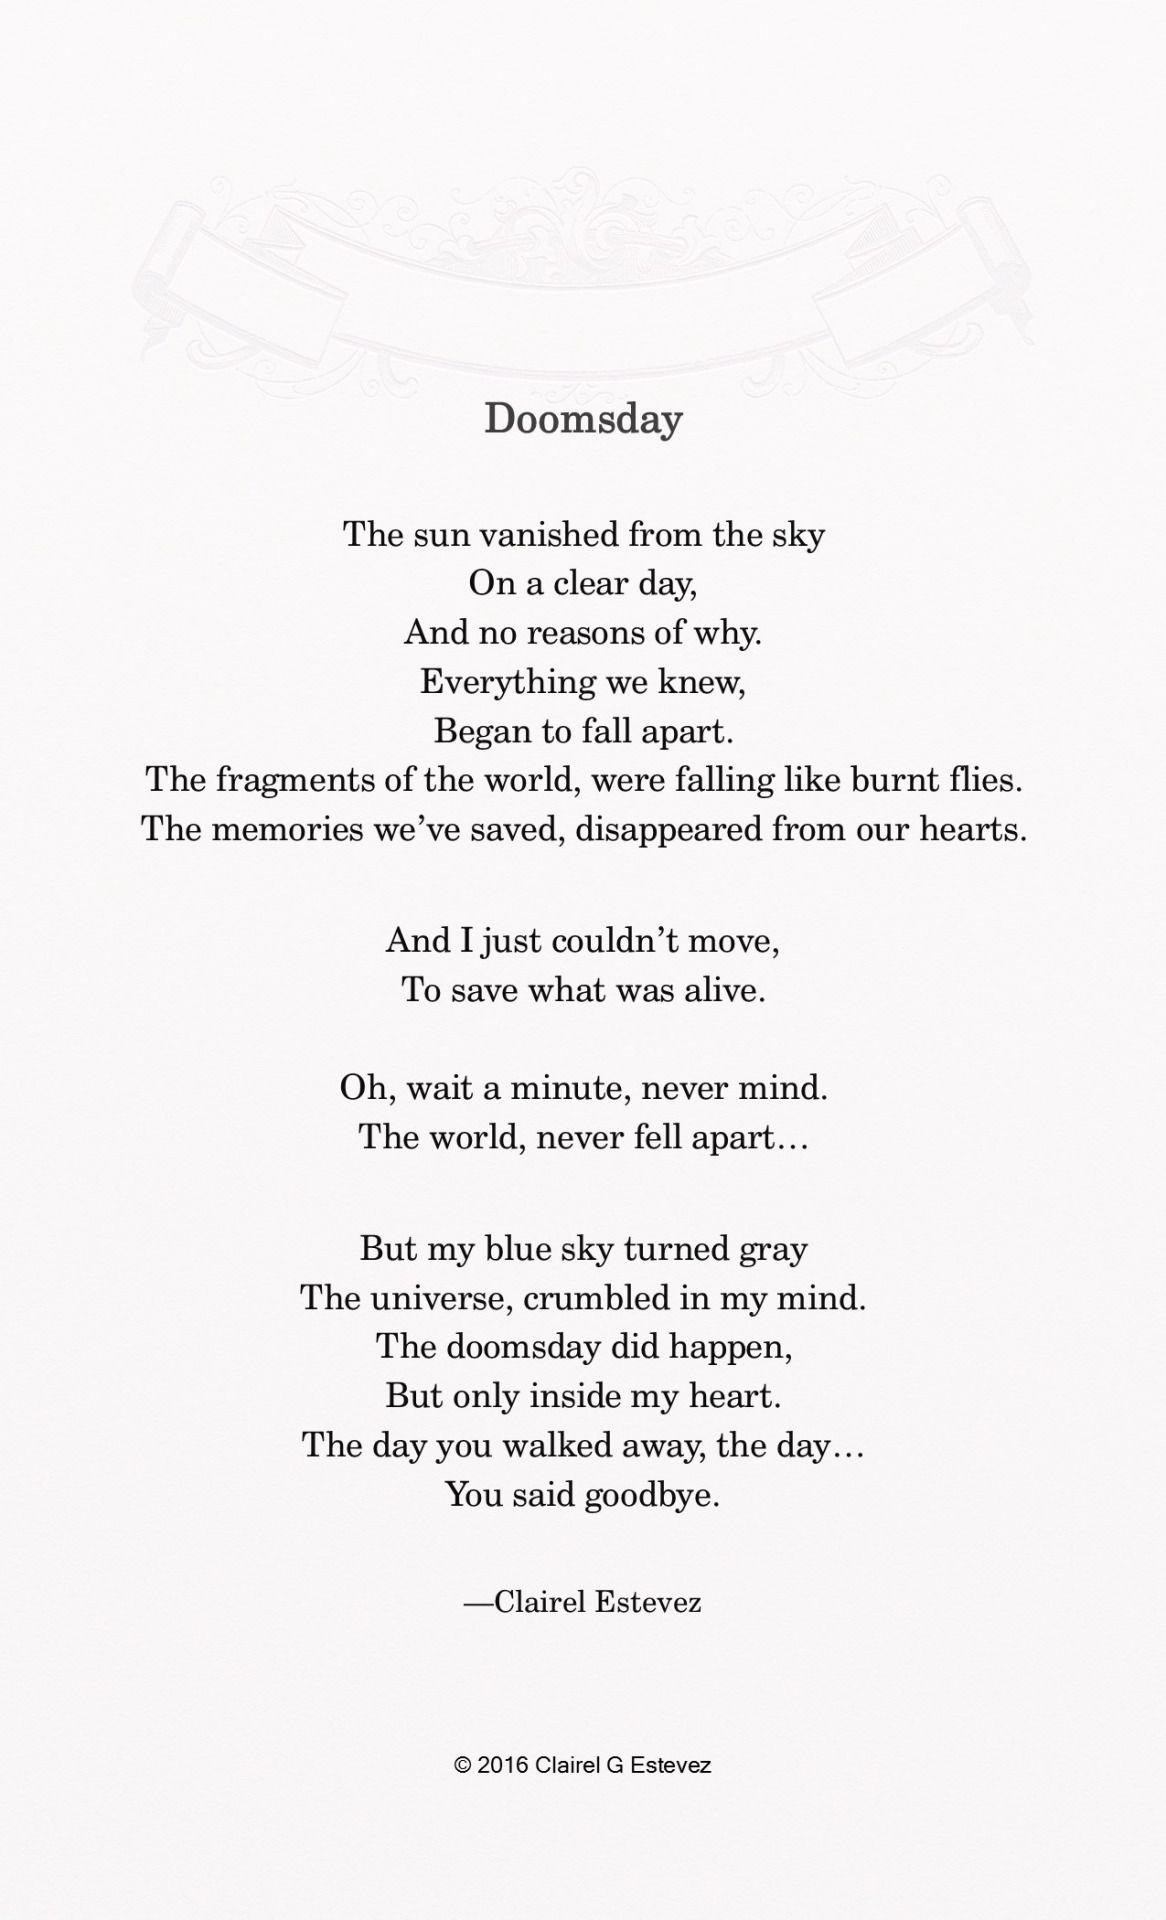 Doomsday Follow The Wishful Box Blog For All Original Inspirational